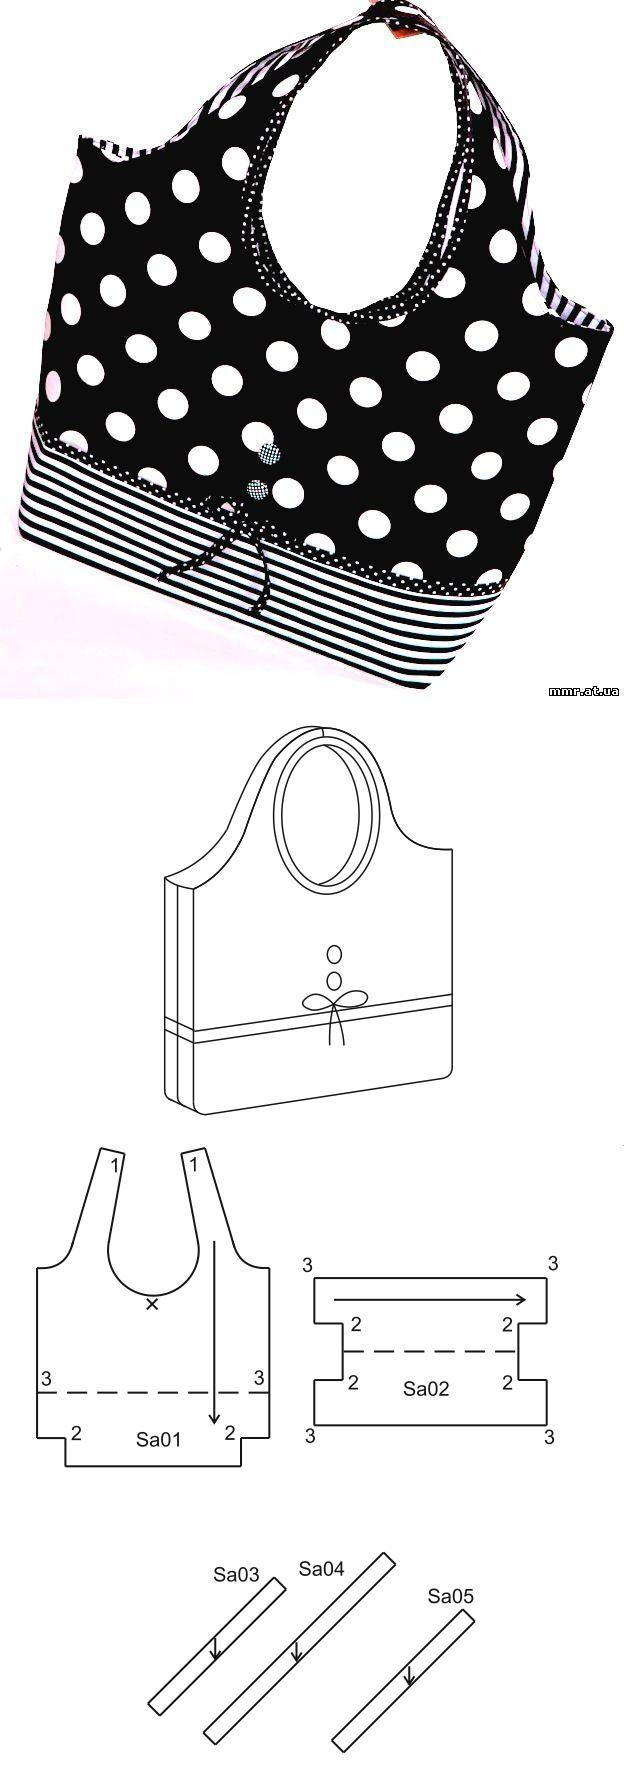 Bolsas | ideas | Pinterest | Bolsos, Costura y Tela